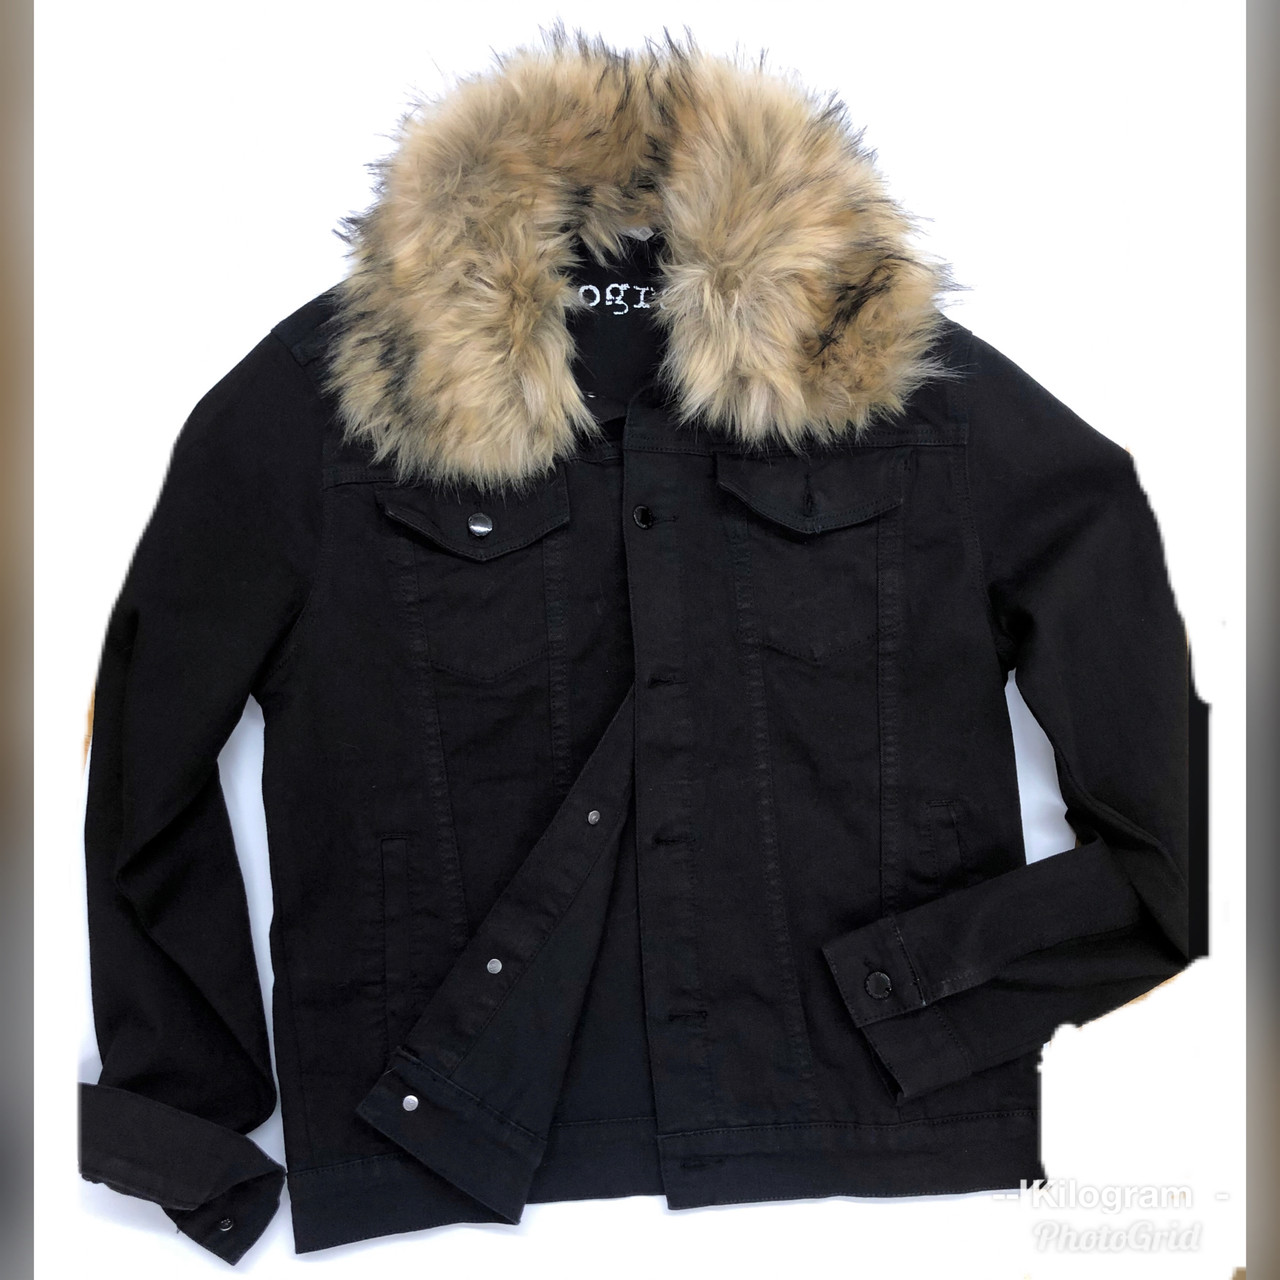 c0e46869 Detachable Faux Fur Denim JACKET KG7803 - JET BLACK - Kilogram Clothing